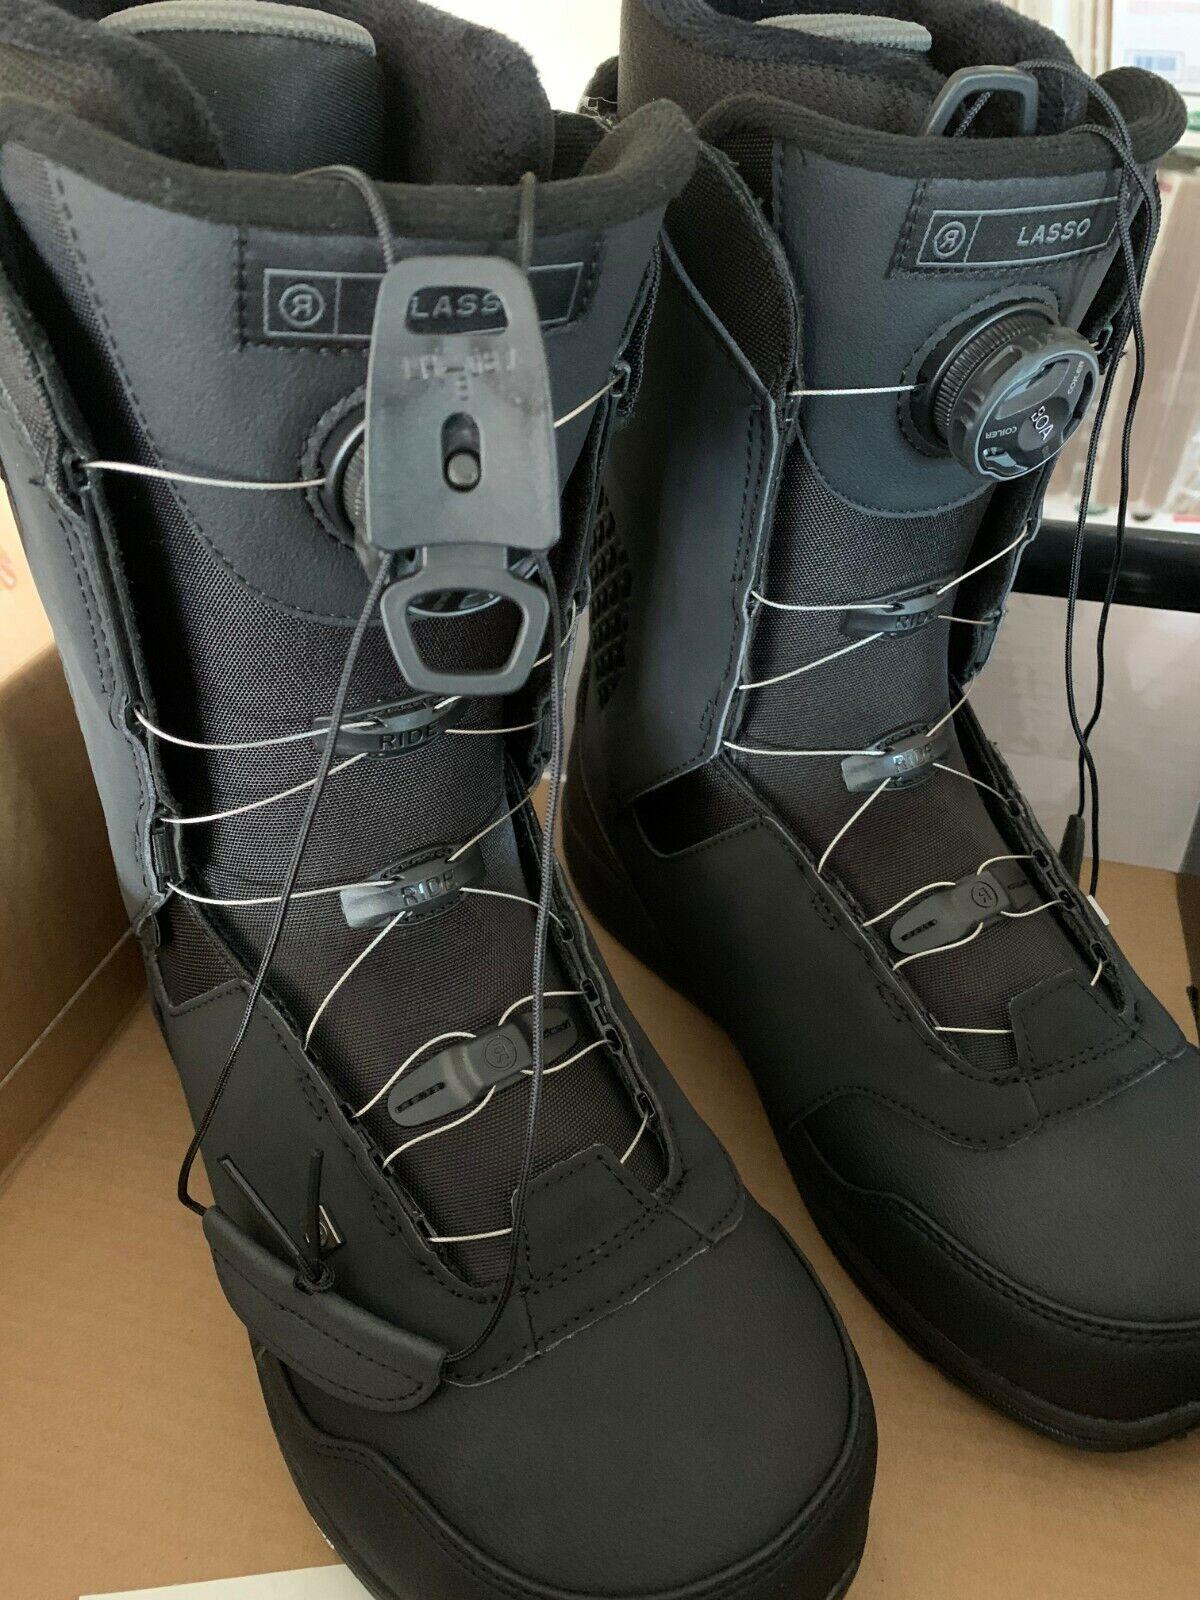 RIDE LASSON Snowboard Boots, NEW  SIZE 12